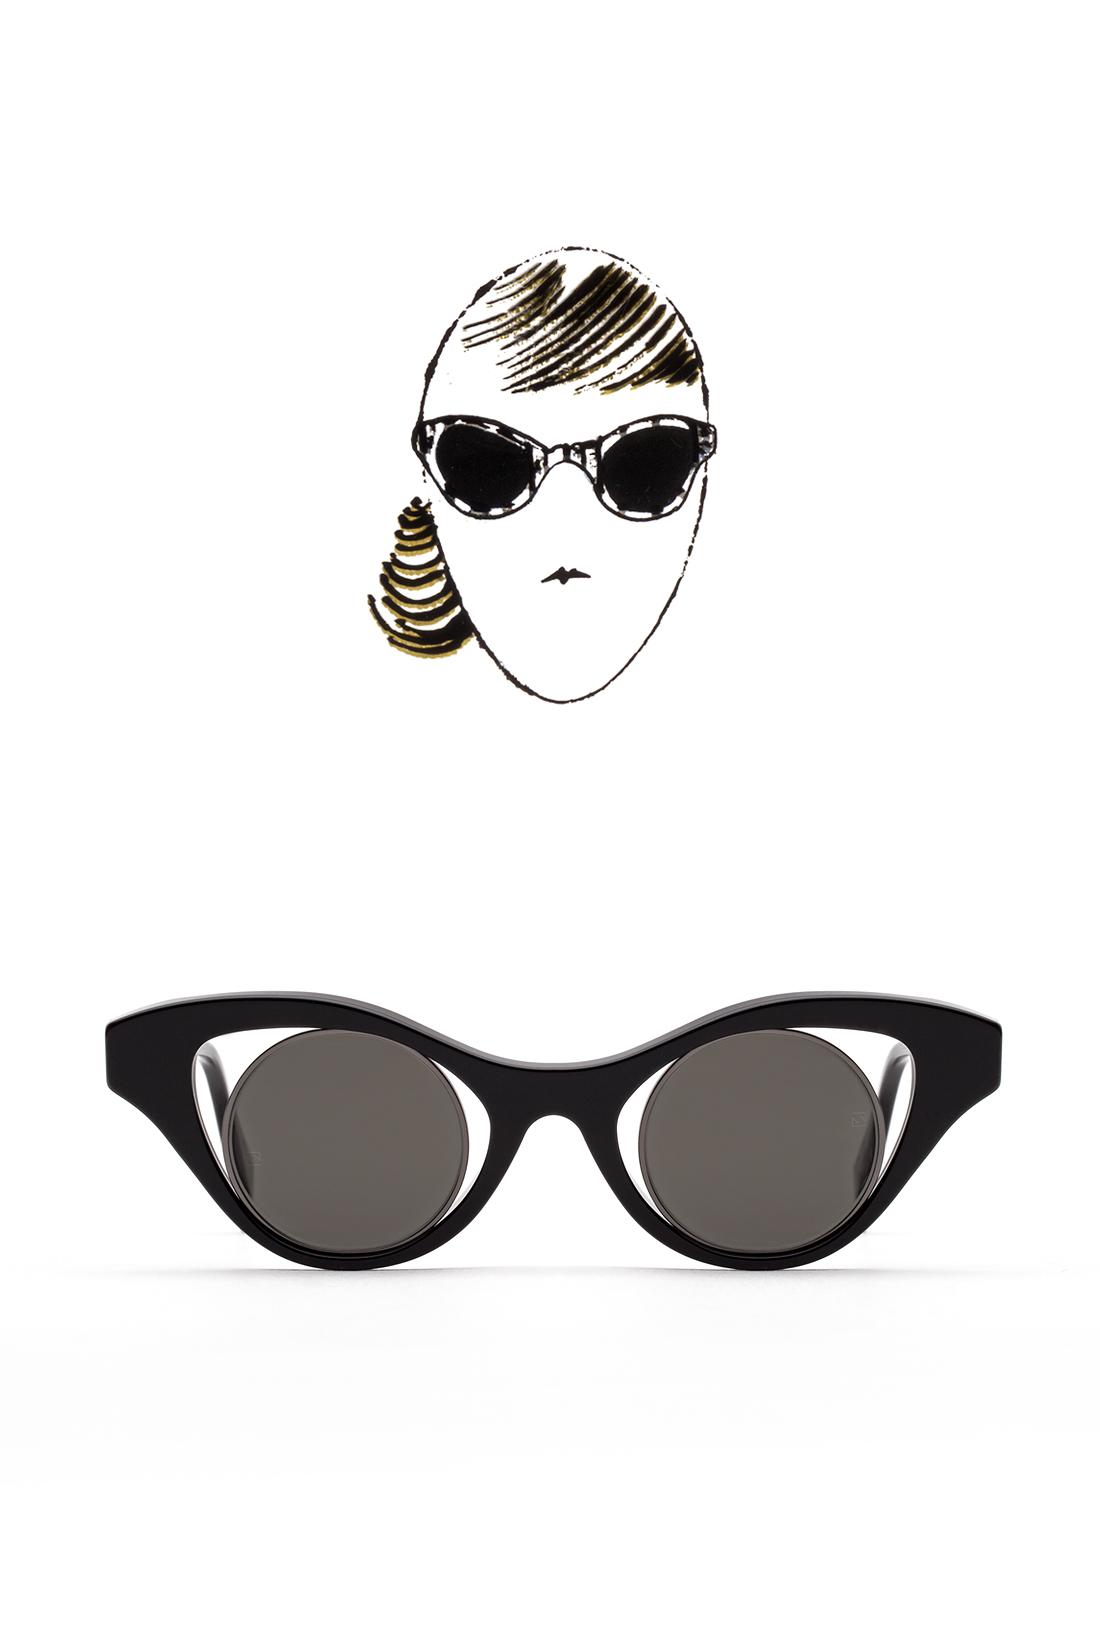 andy-warhol-retrosuperfuture-sunglasses-03